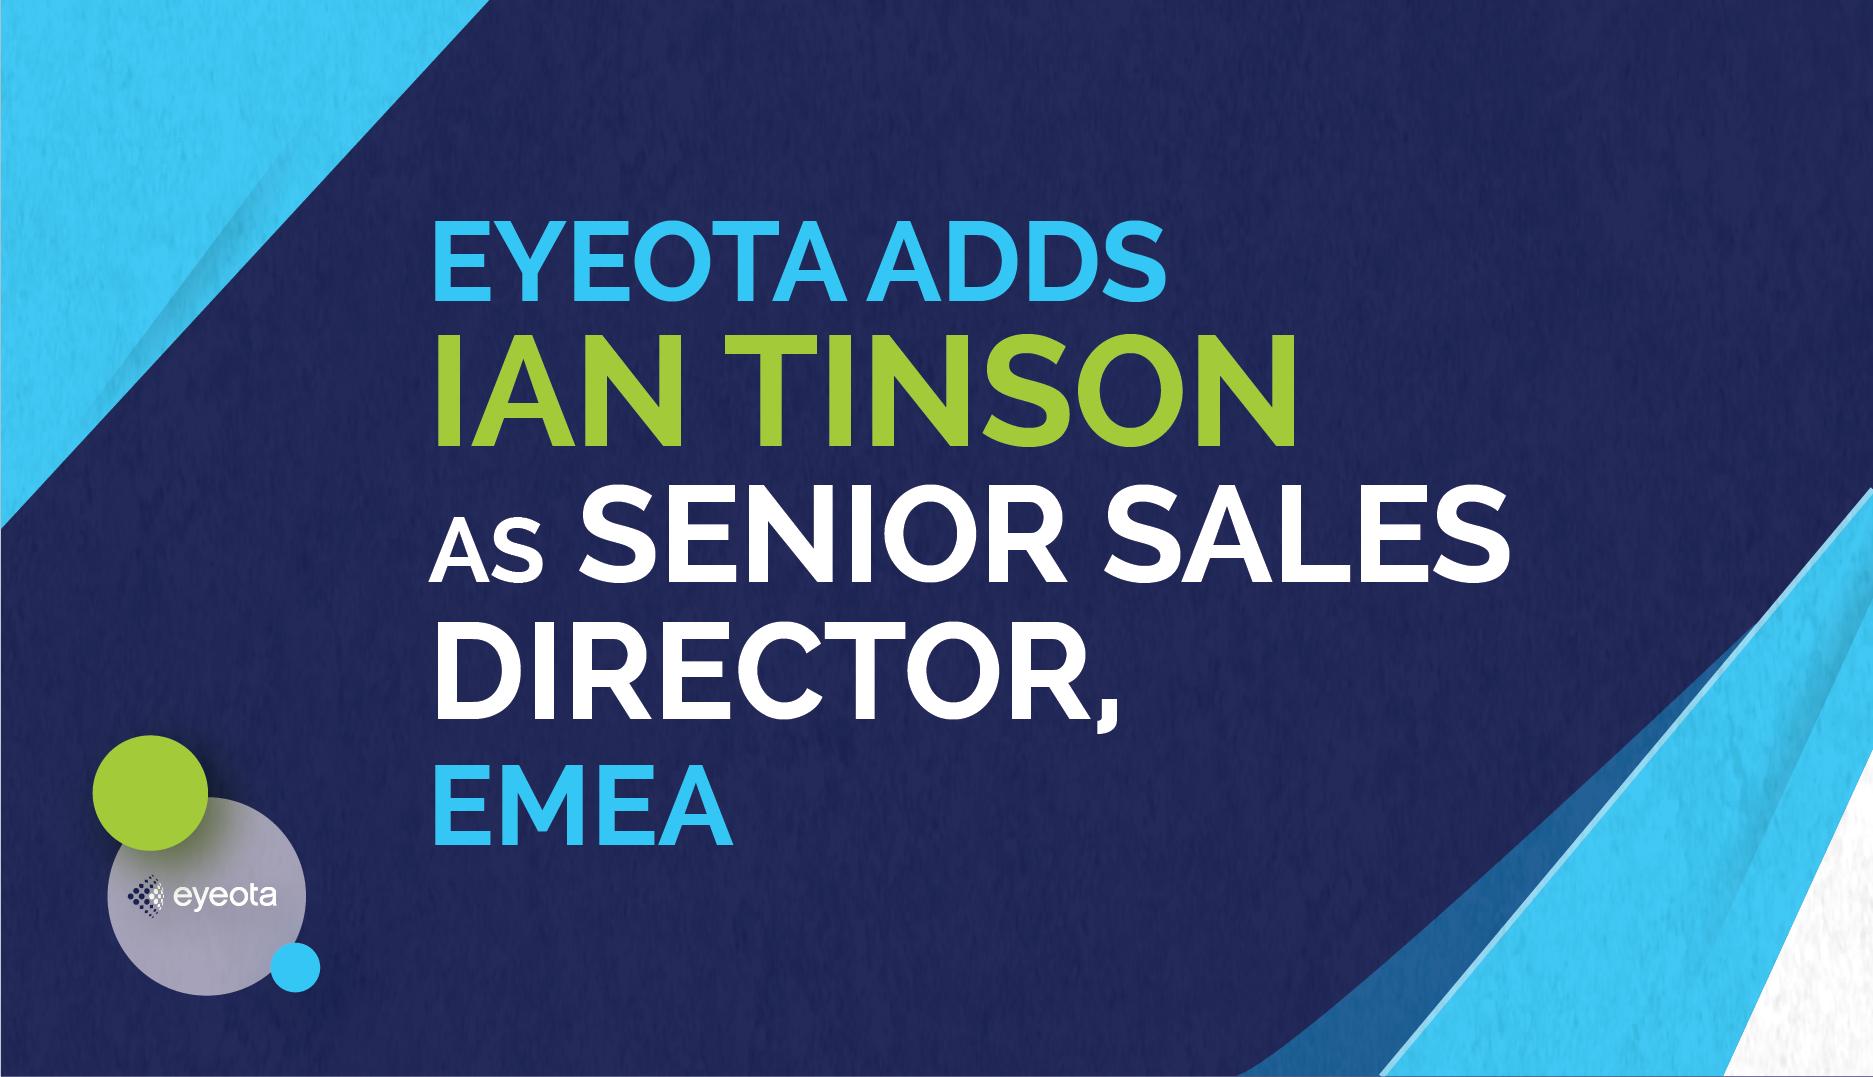 Ian Tinson Joins Eyeota as Senior Sales Director, EMEA